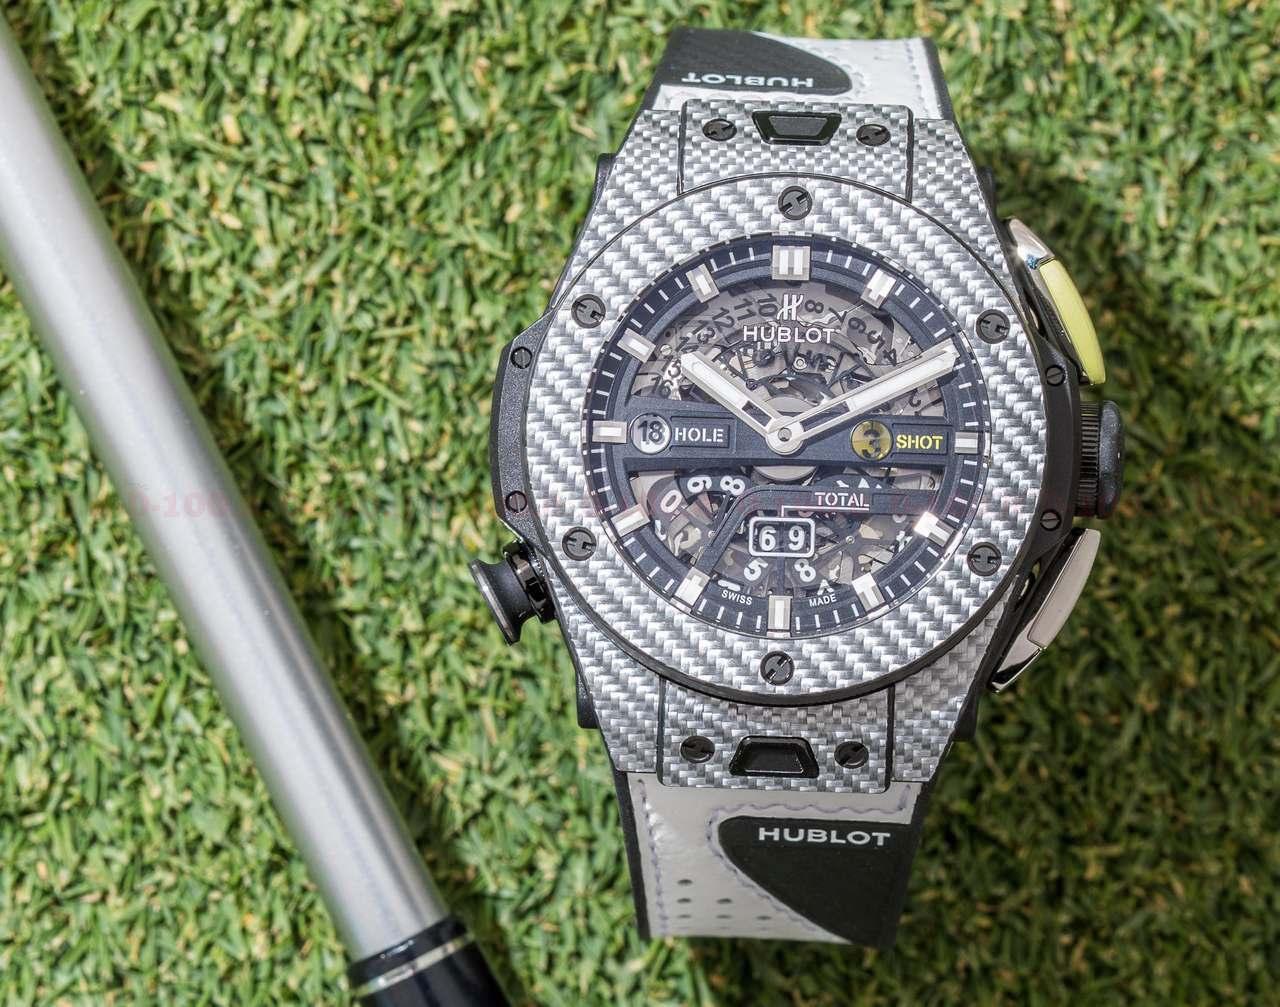 Hublot Big Bang Unico Golf Ref. 416.YS.1120.VR Dustin Johnson_0-100_price_0-1003